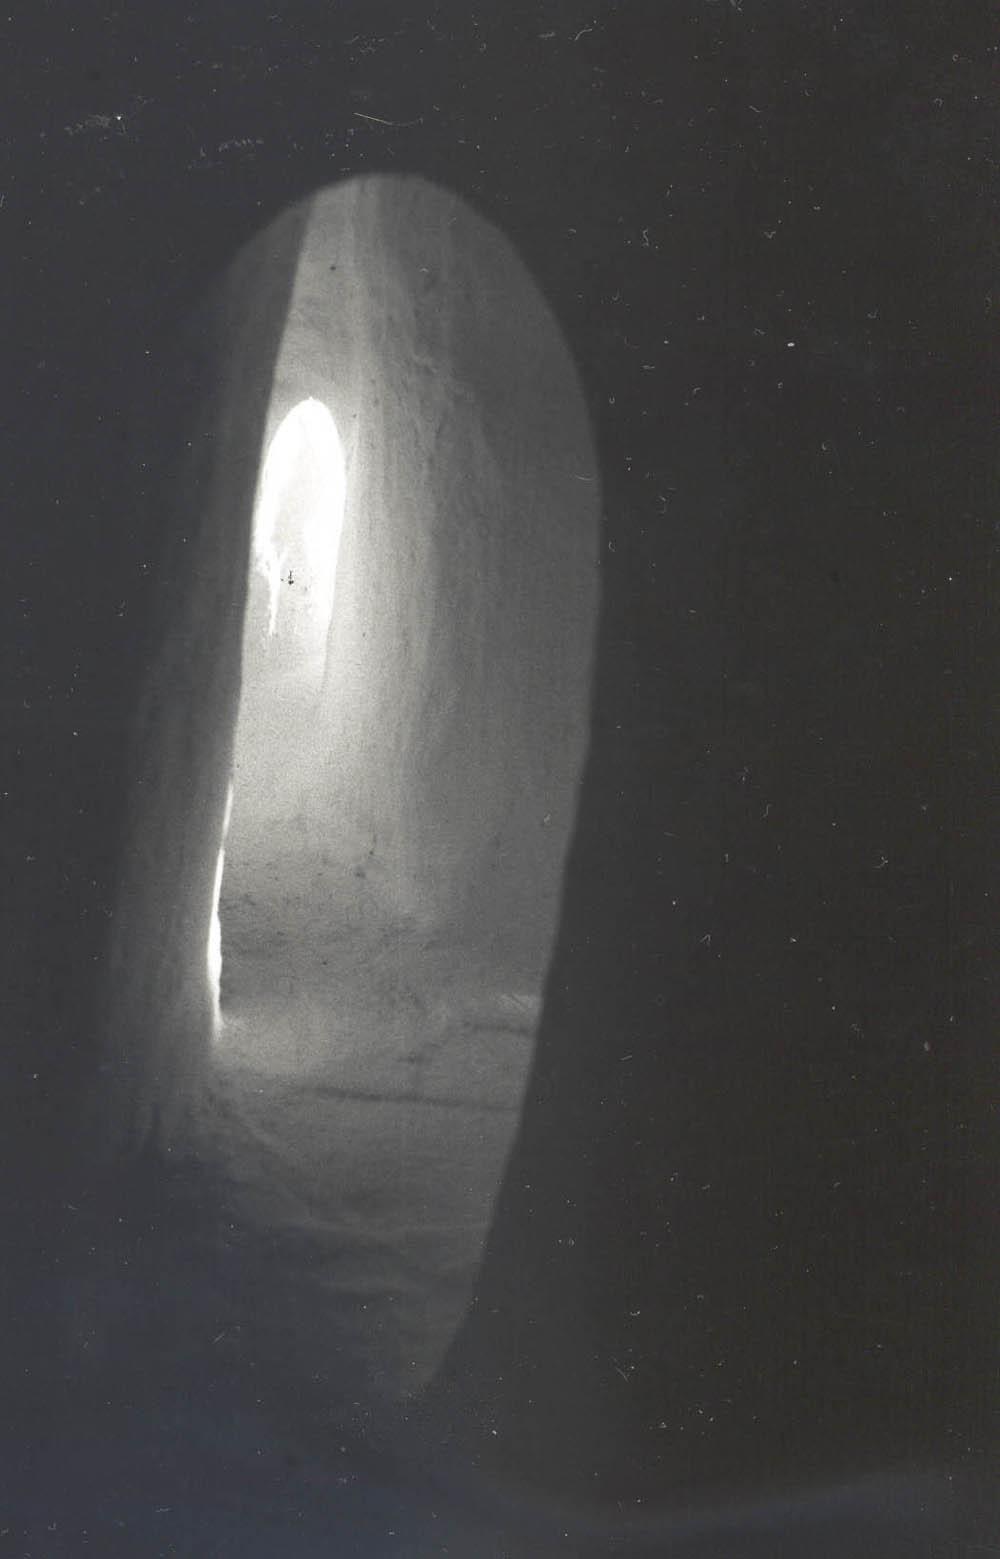 004-web-labyrinth-1.jpg